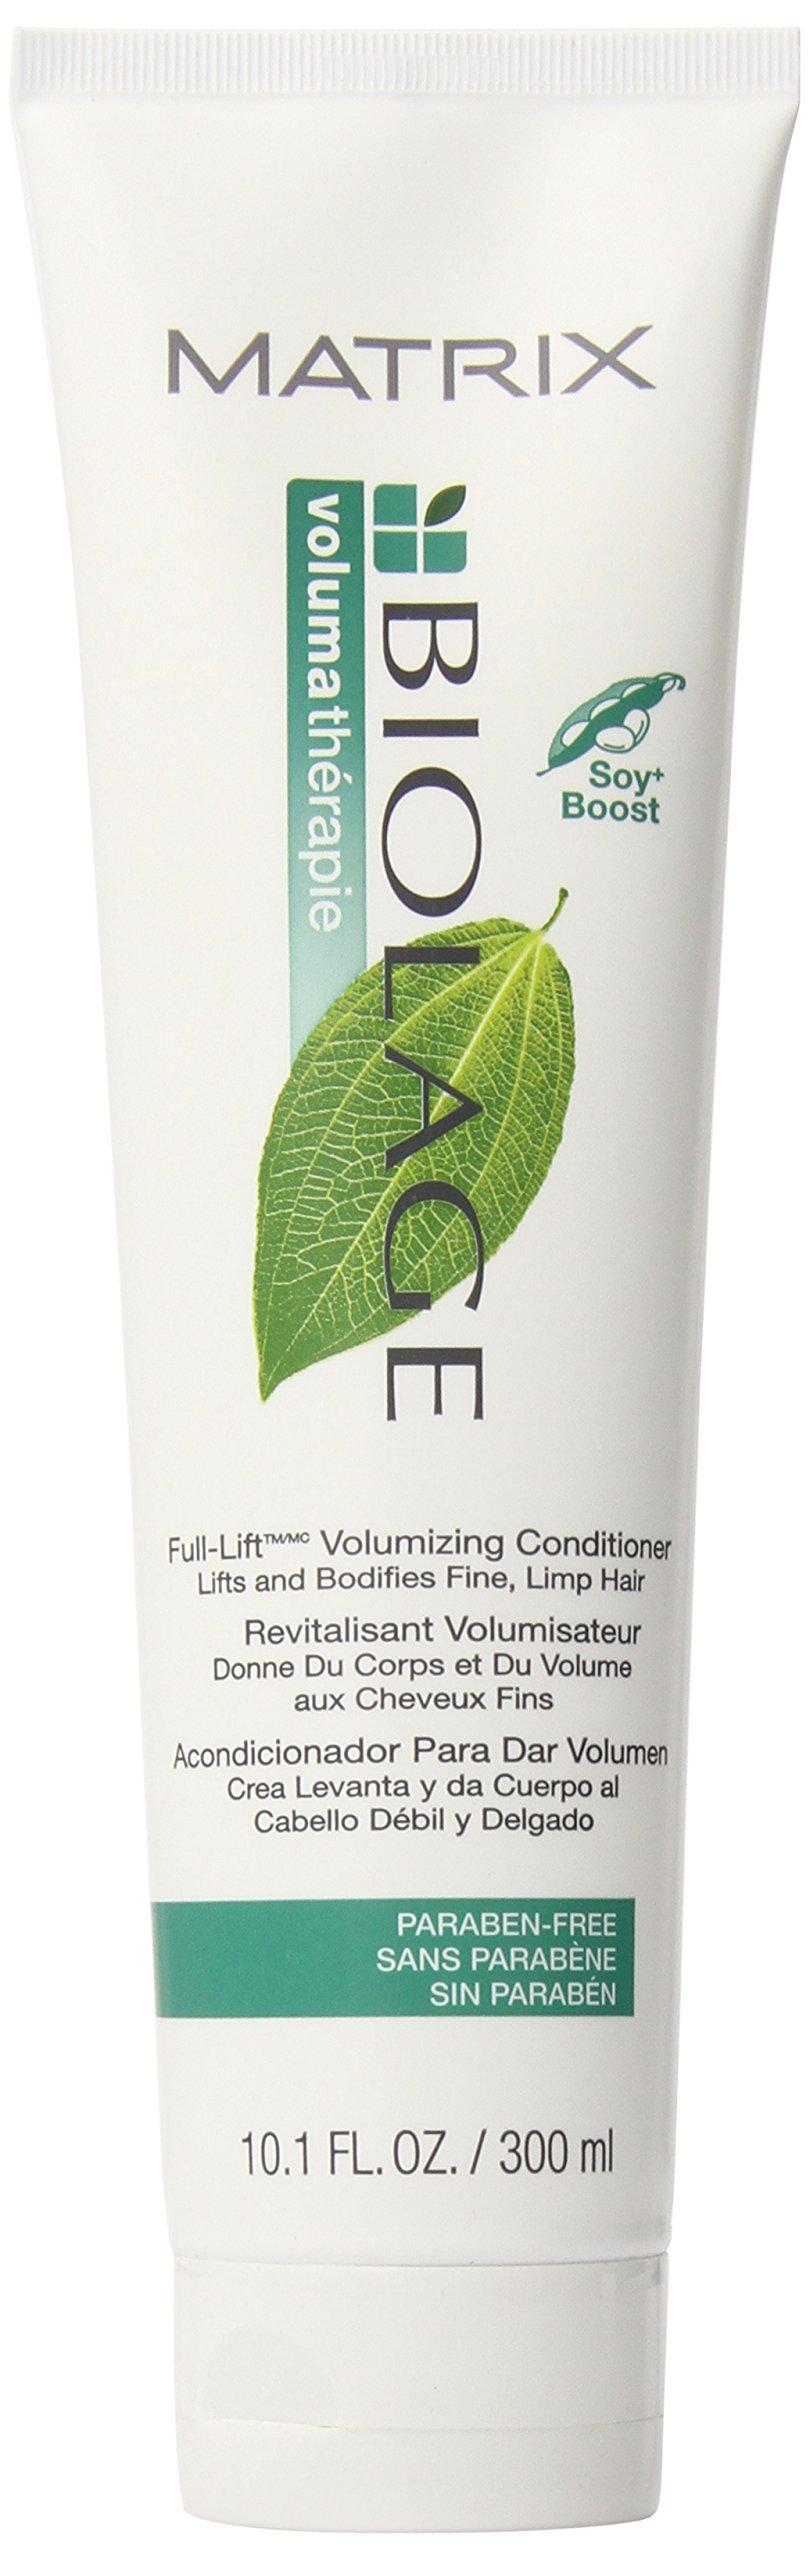 Matrix Volumatherapie Full Lift Volumizing Conditioner, 10.1 Ounce